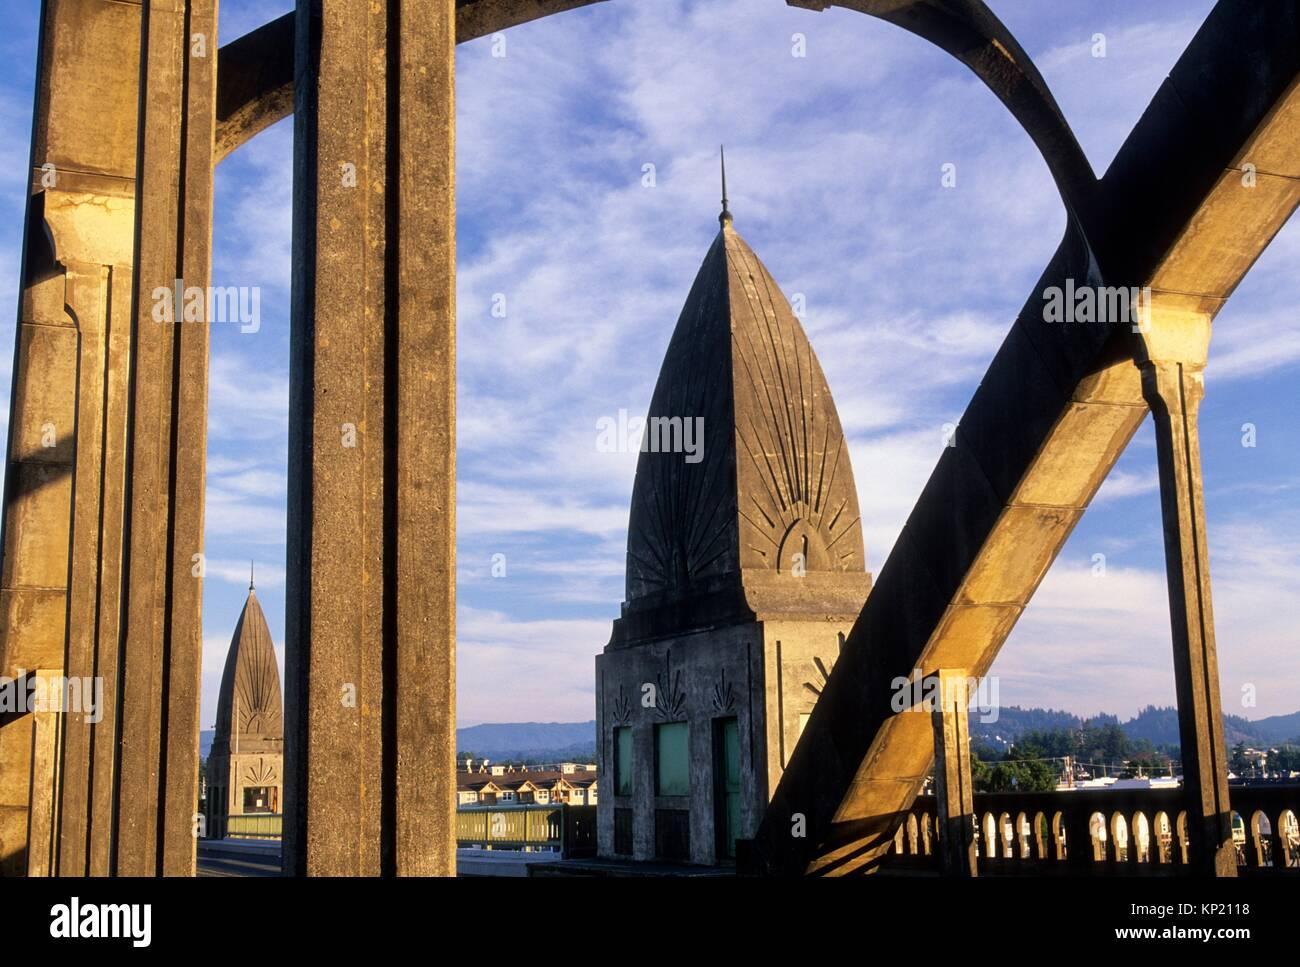 Siuslaw River Bridge, Florence, Oregon. Stockbild